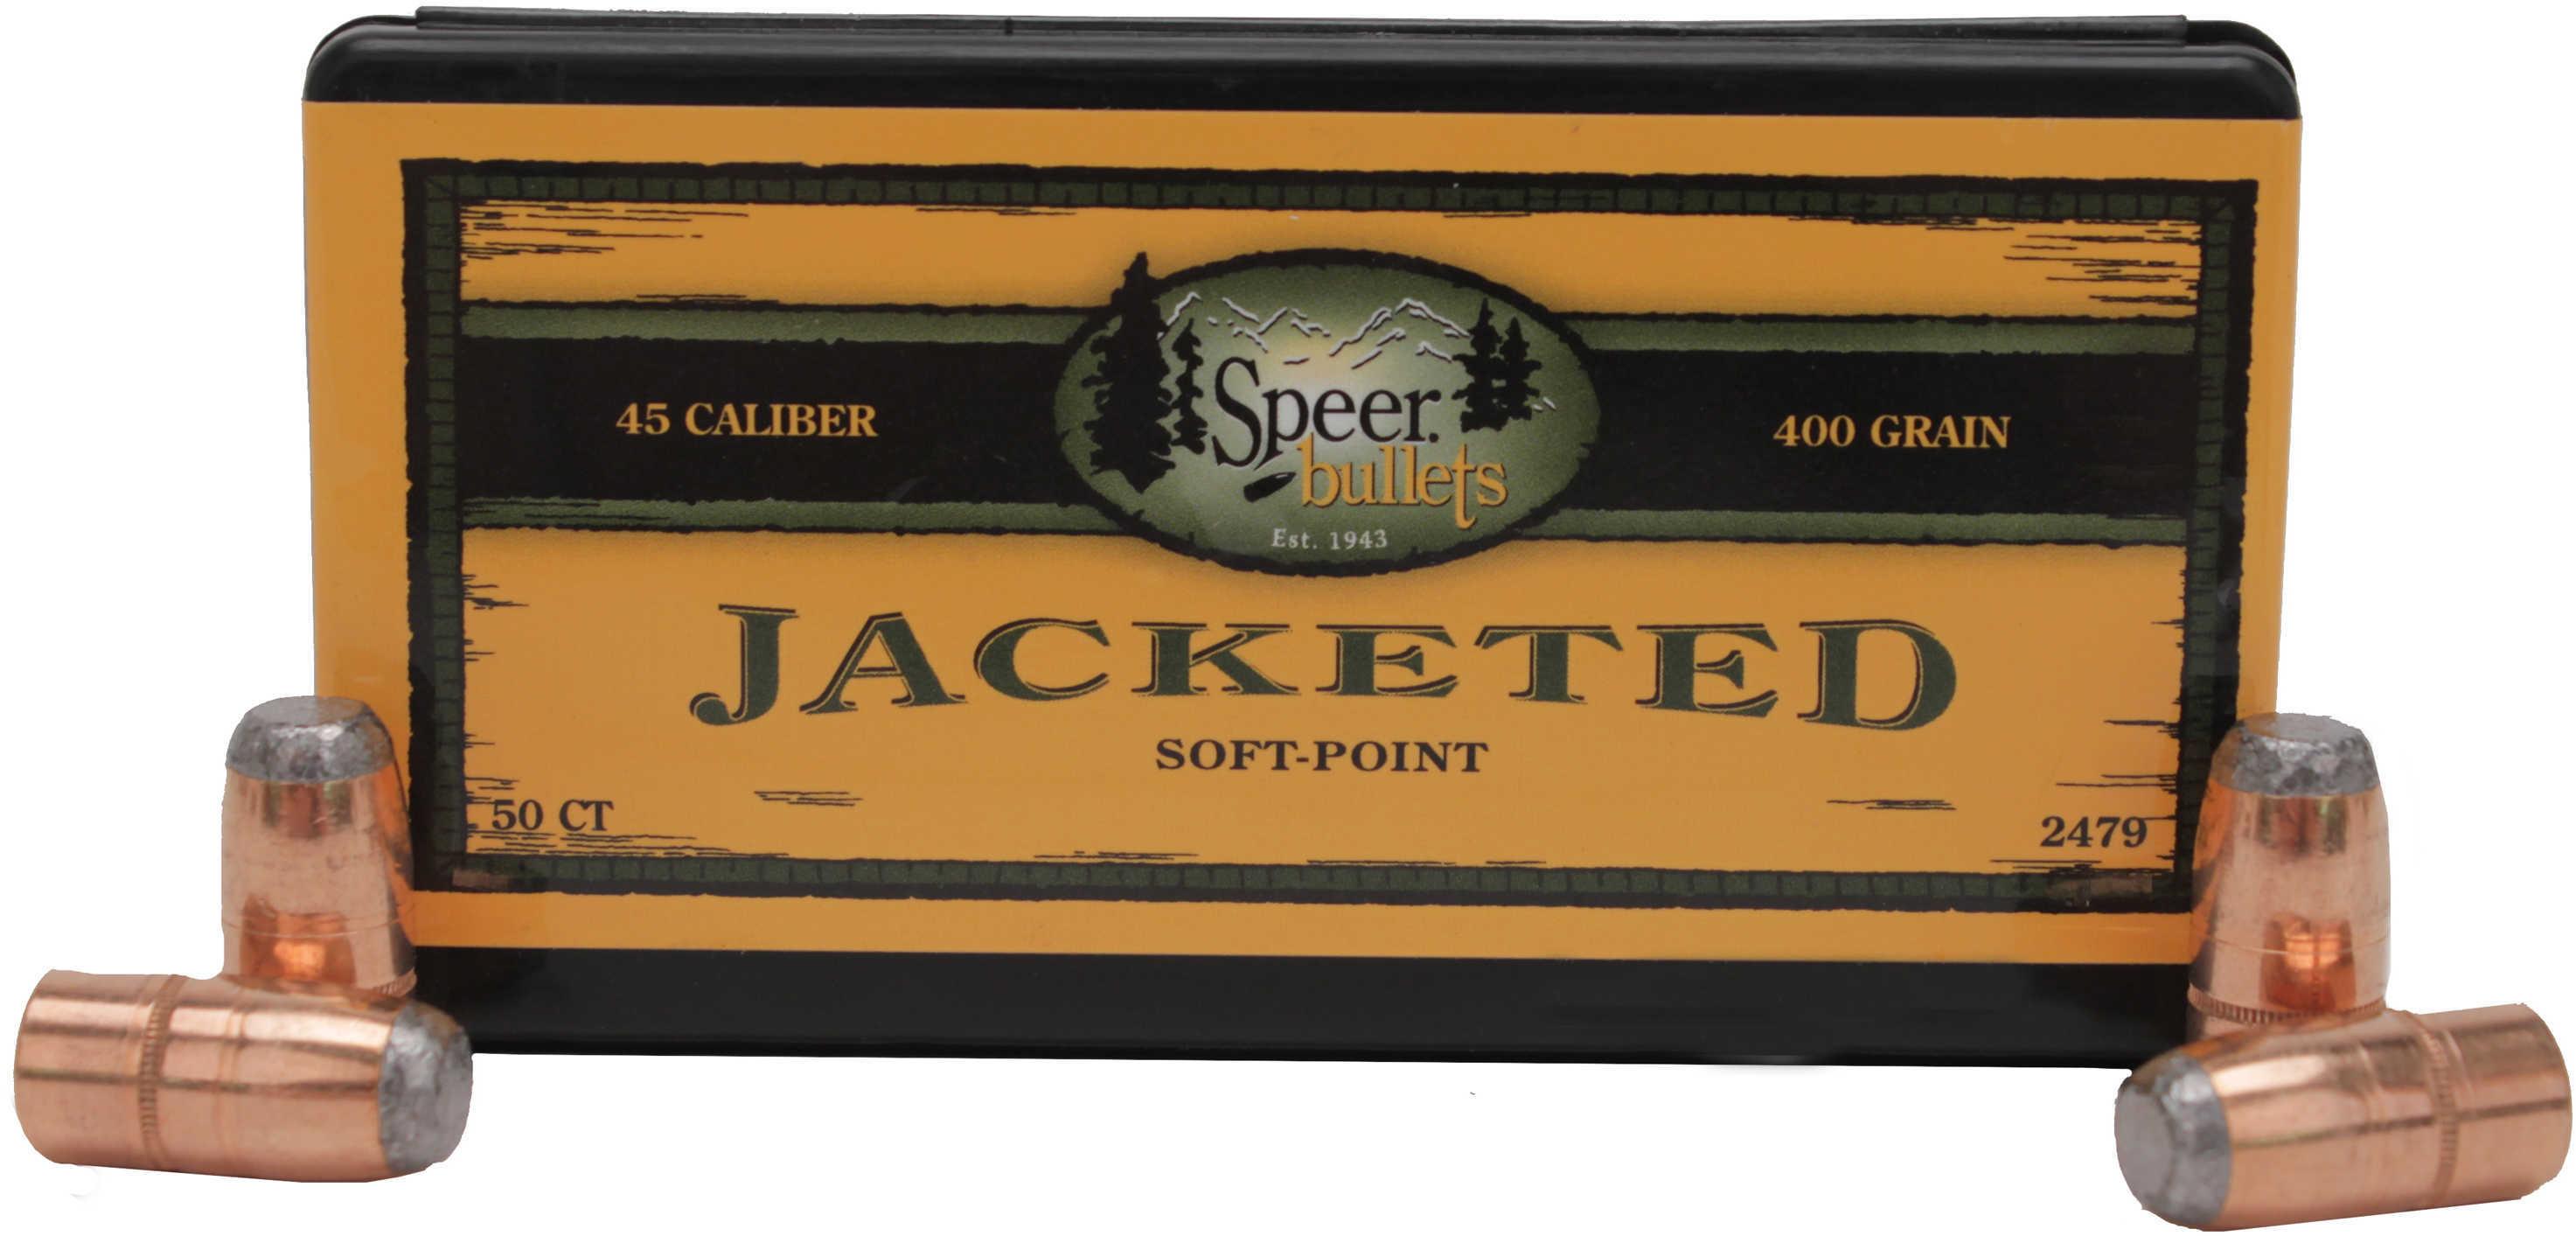 Speer 45 Caliber 400 Grains FN SP Per 50 Md: 2479 Bullets